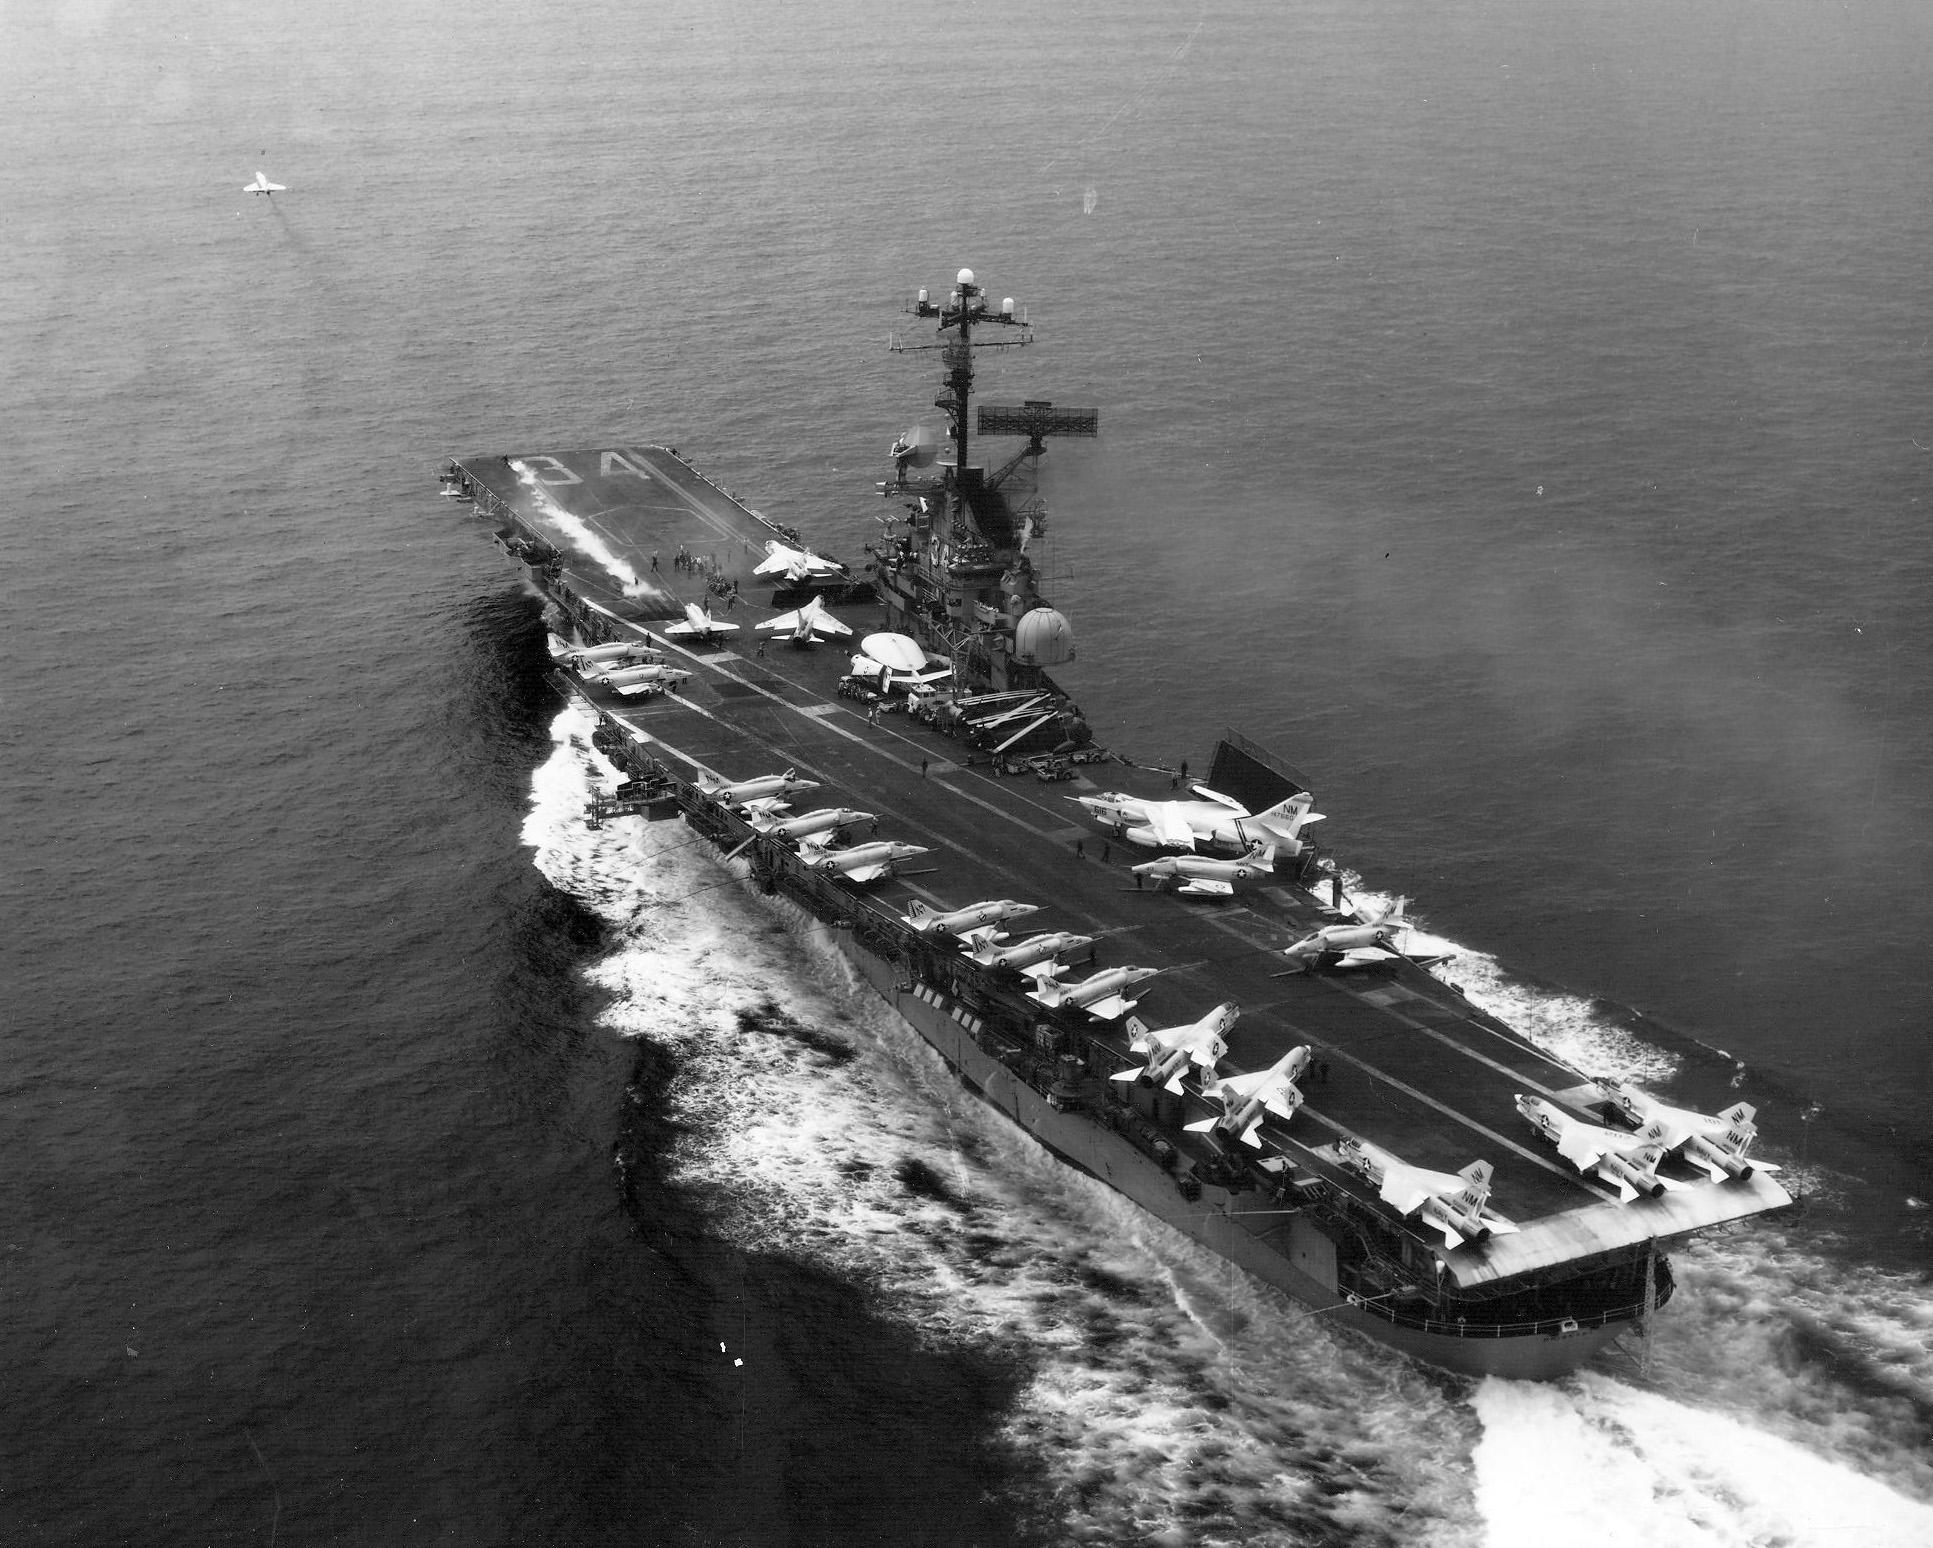 File:USS Oriskany (CVA-34) launches A-4 off Vietnam 1969